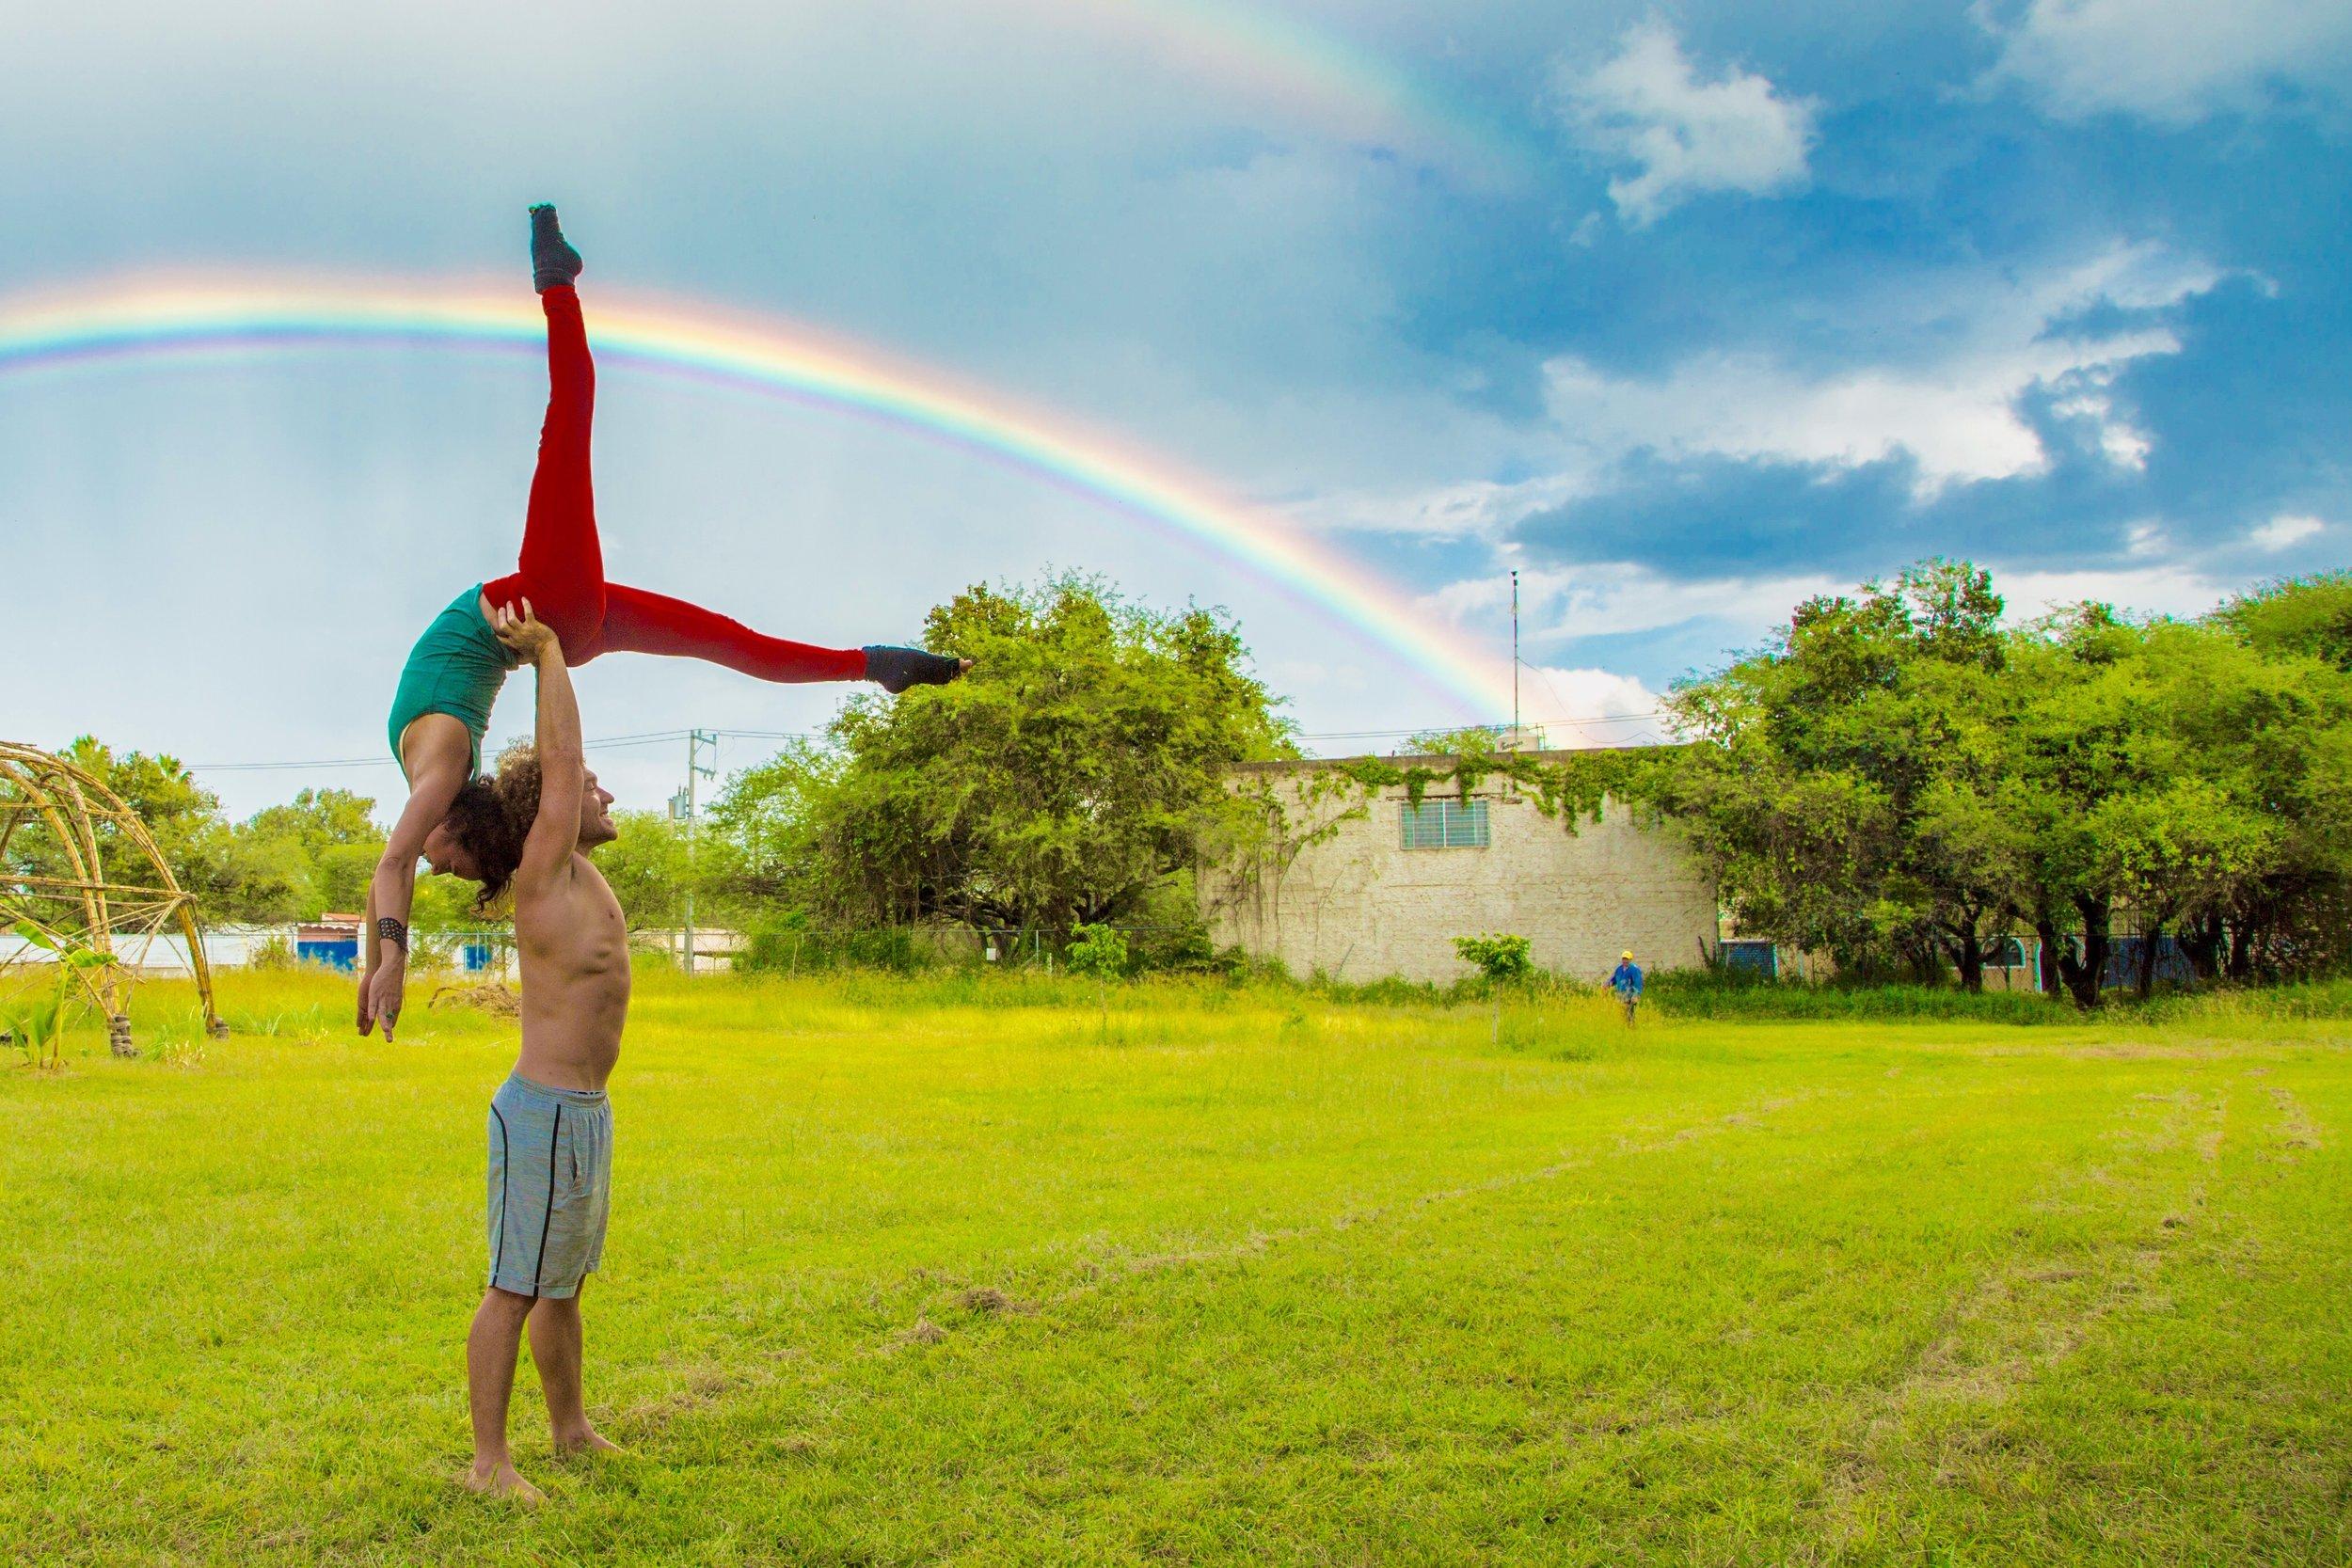 AcroYoga and Rainbows 2